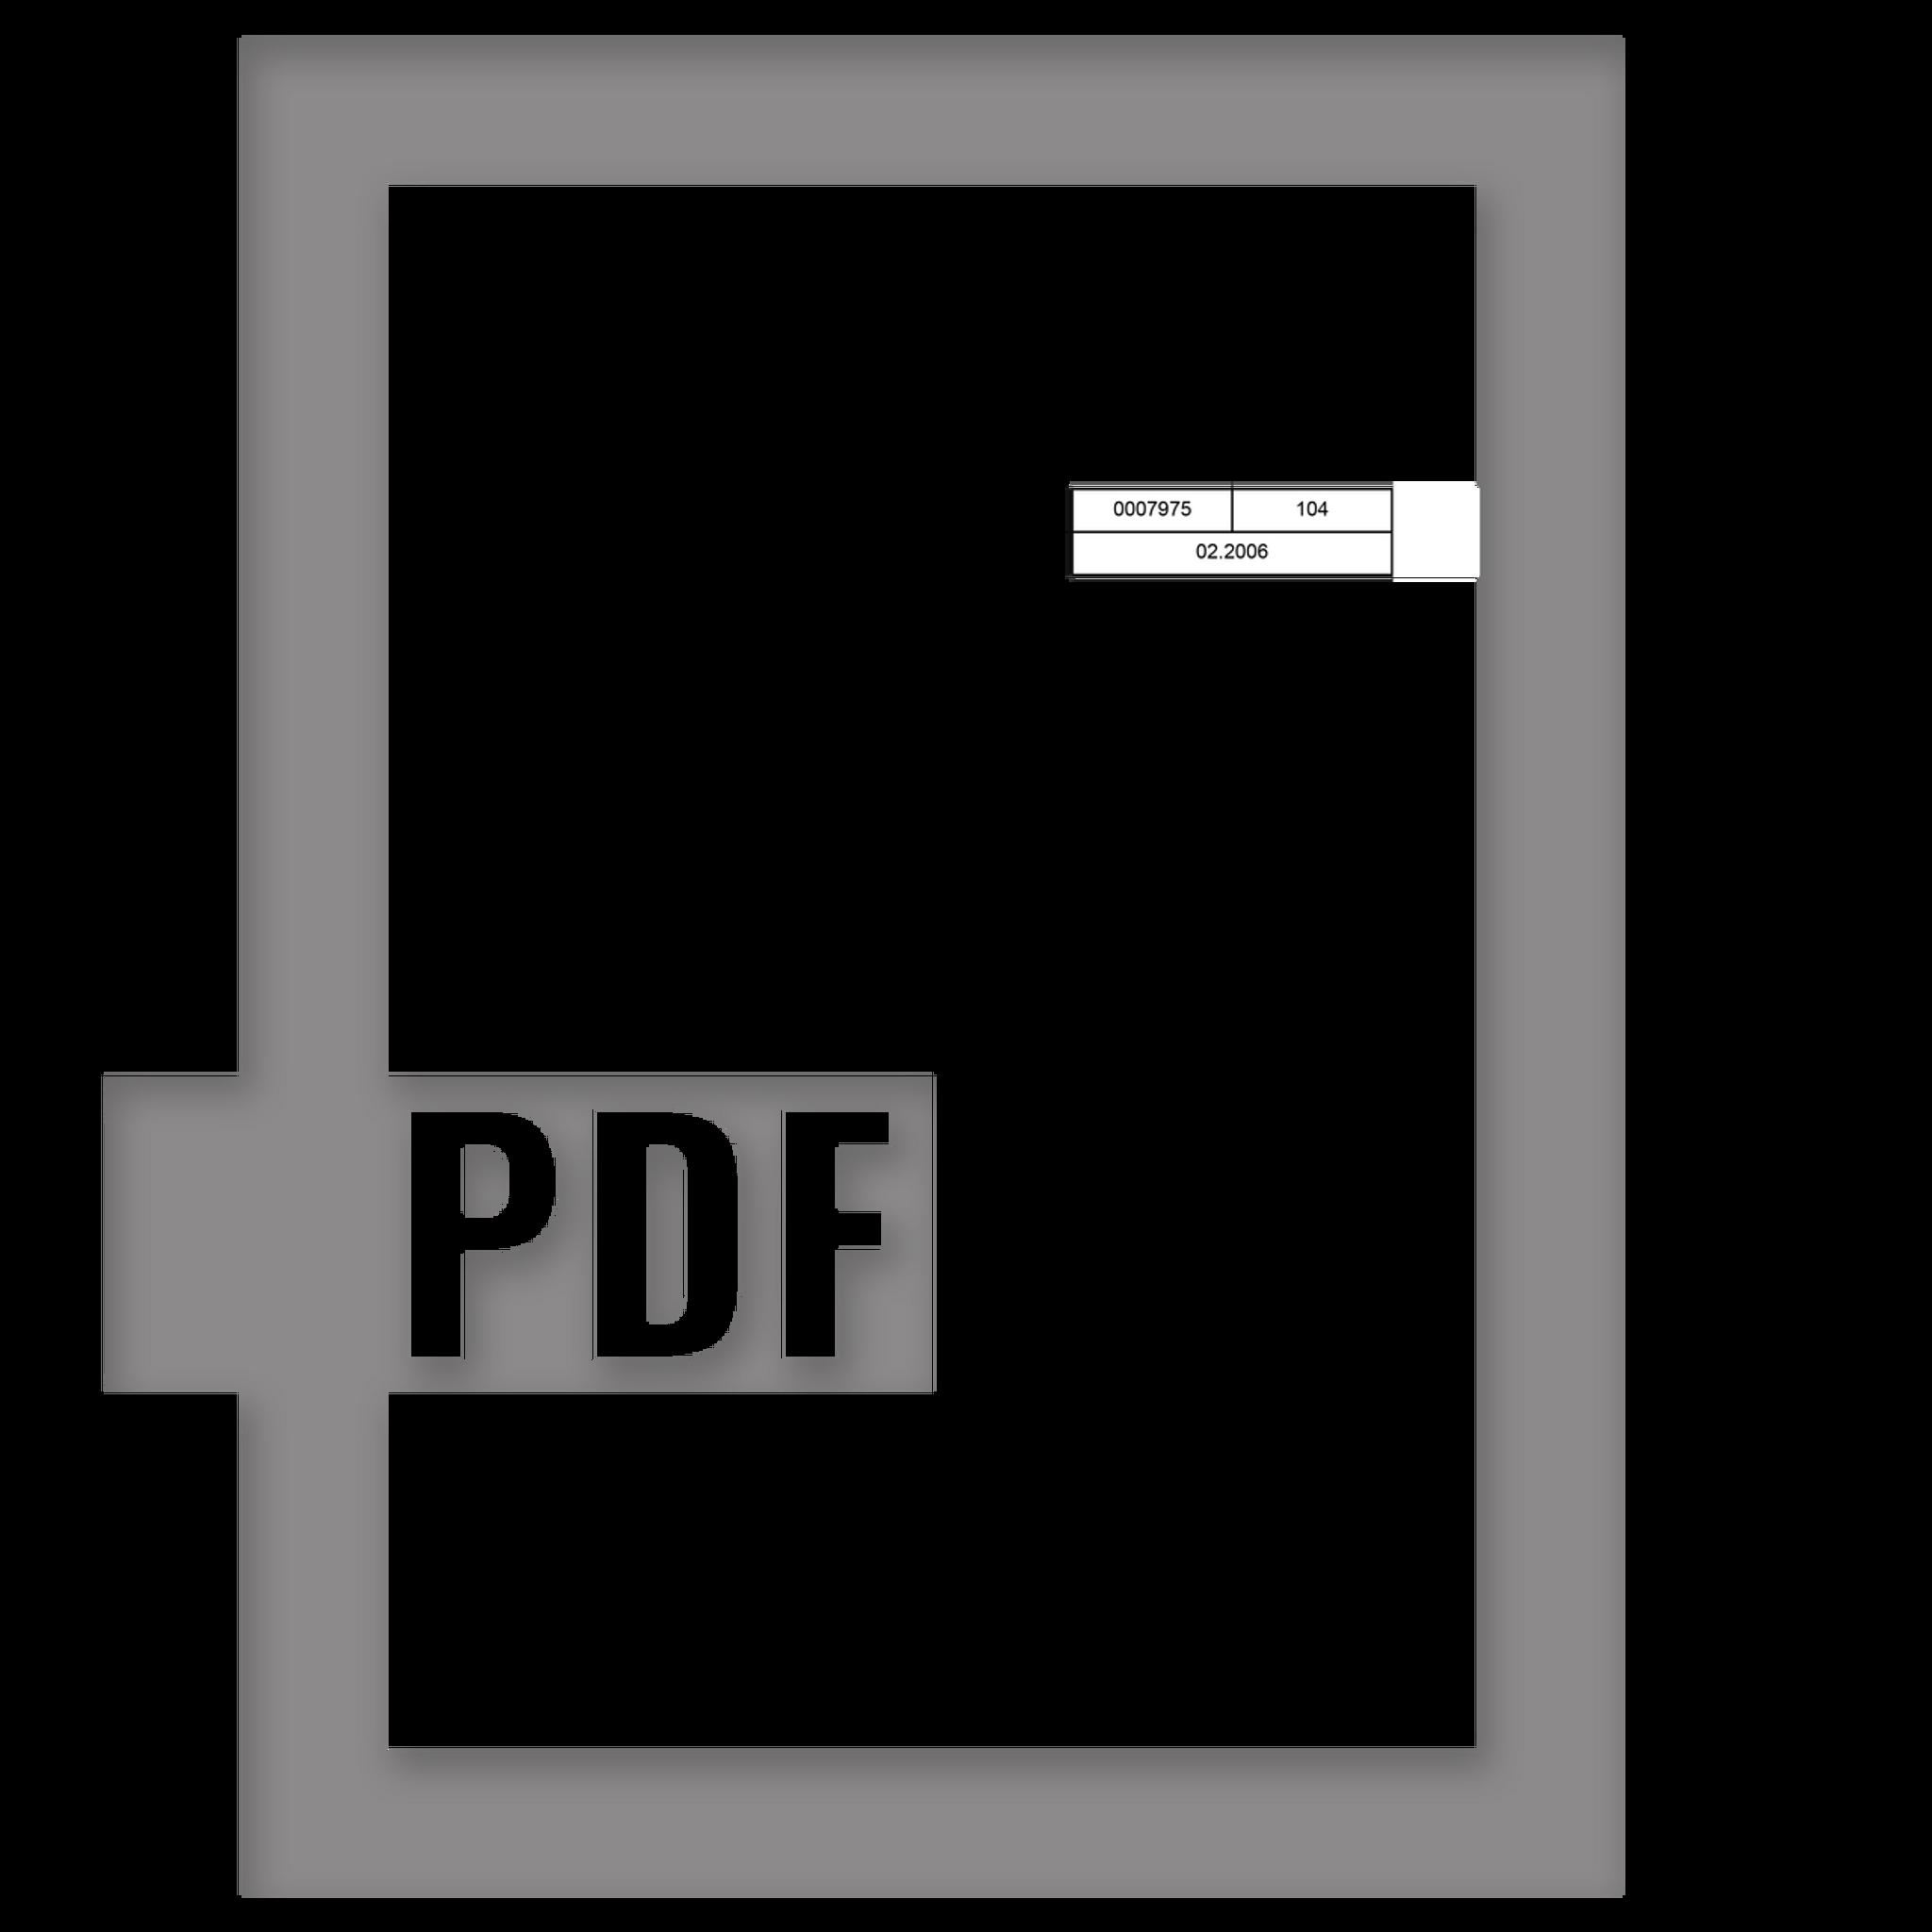 Parts Manual | BTS1035 - Item: 0007975, REV 104 | Free Download